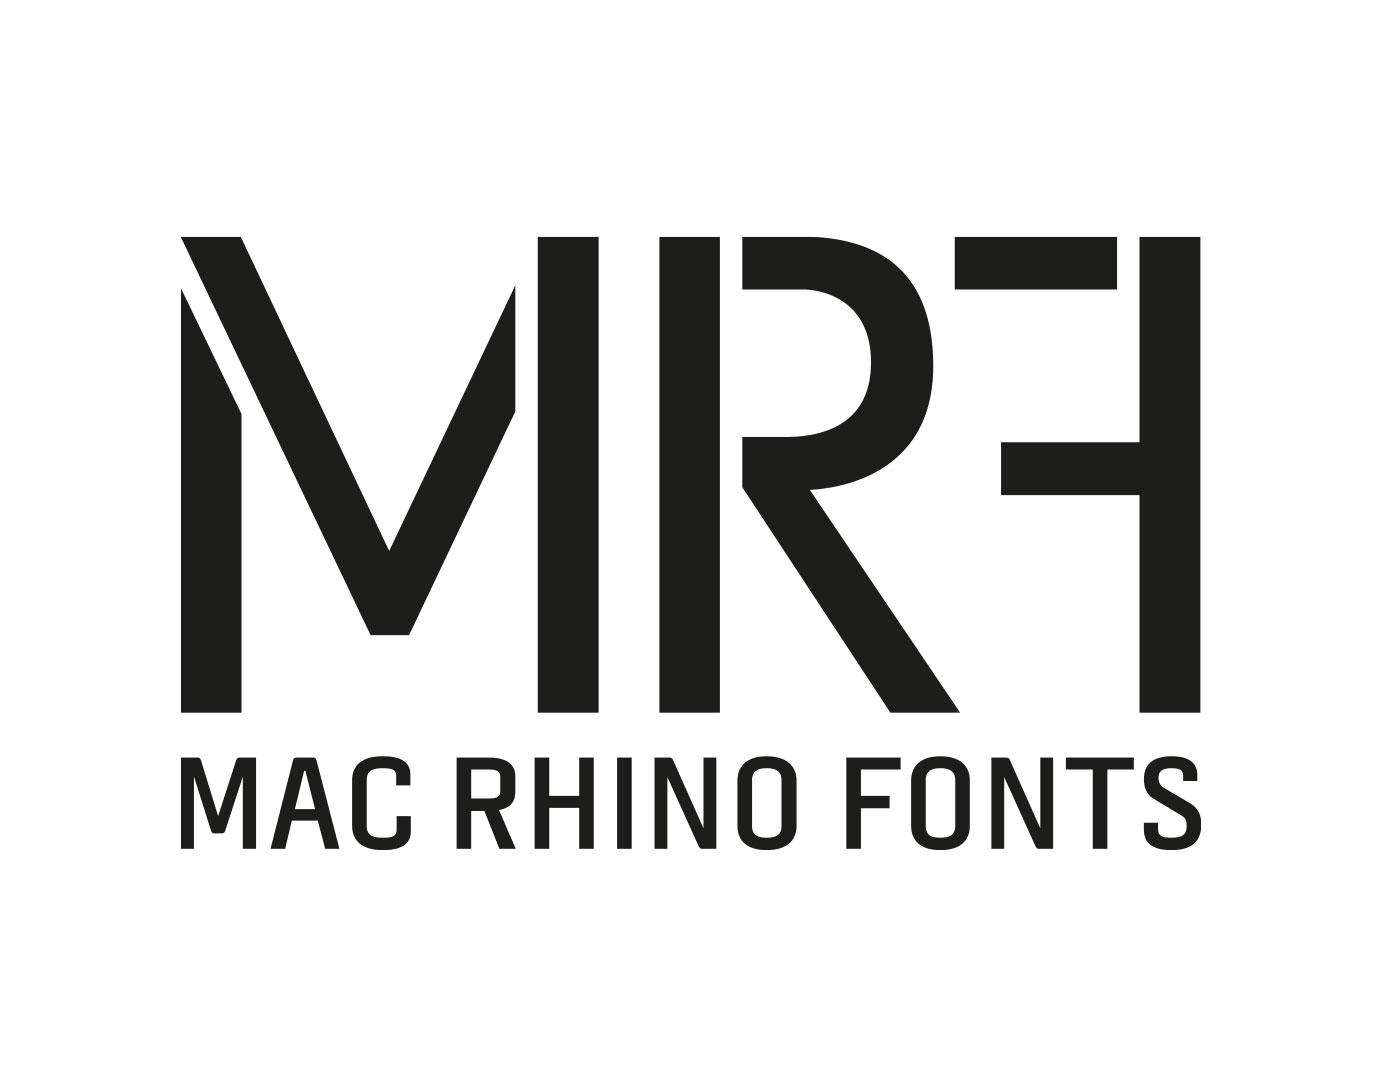 Mac Rhino Fonts